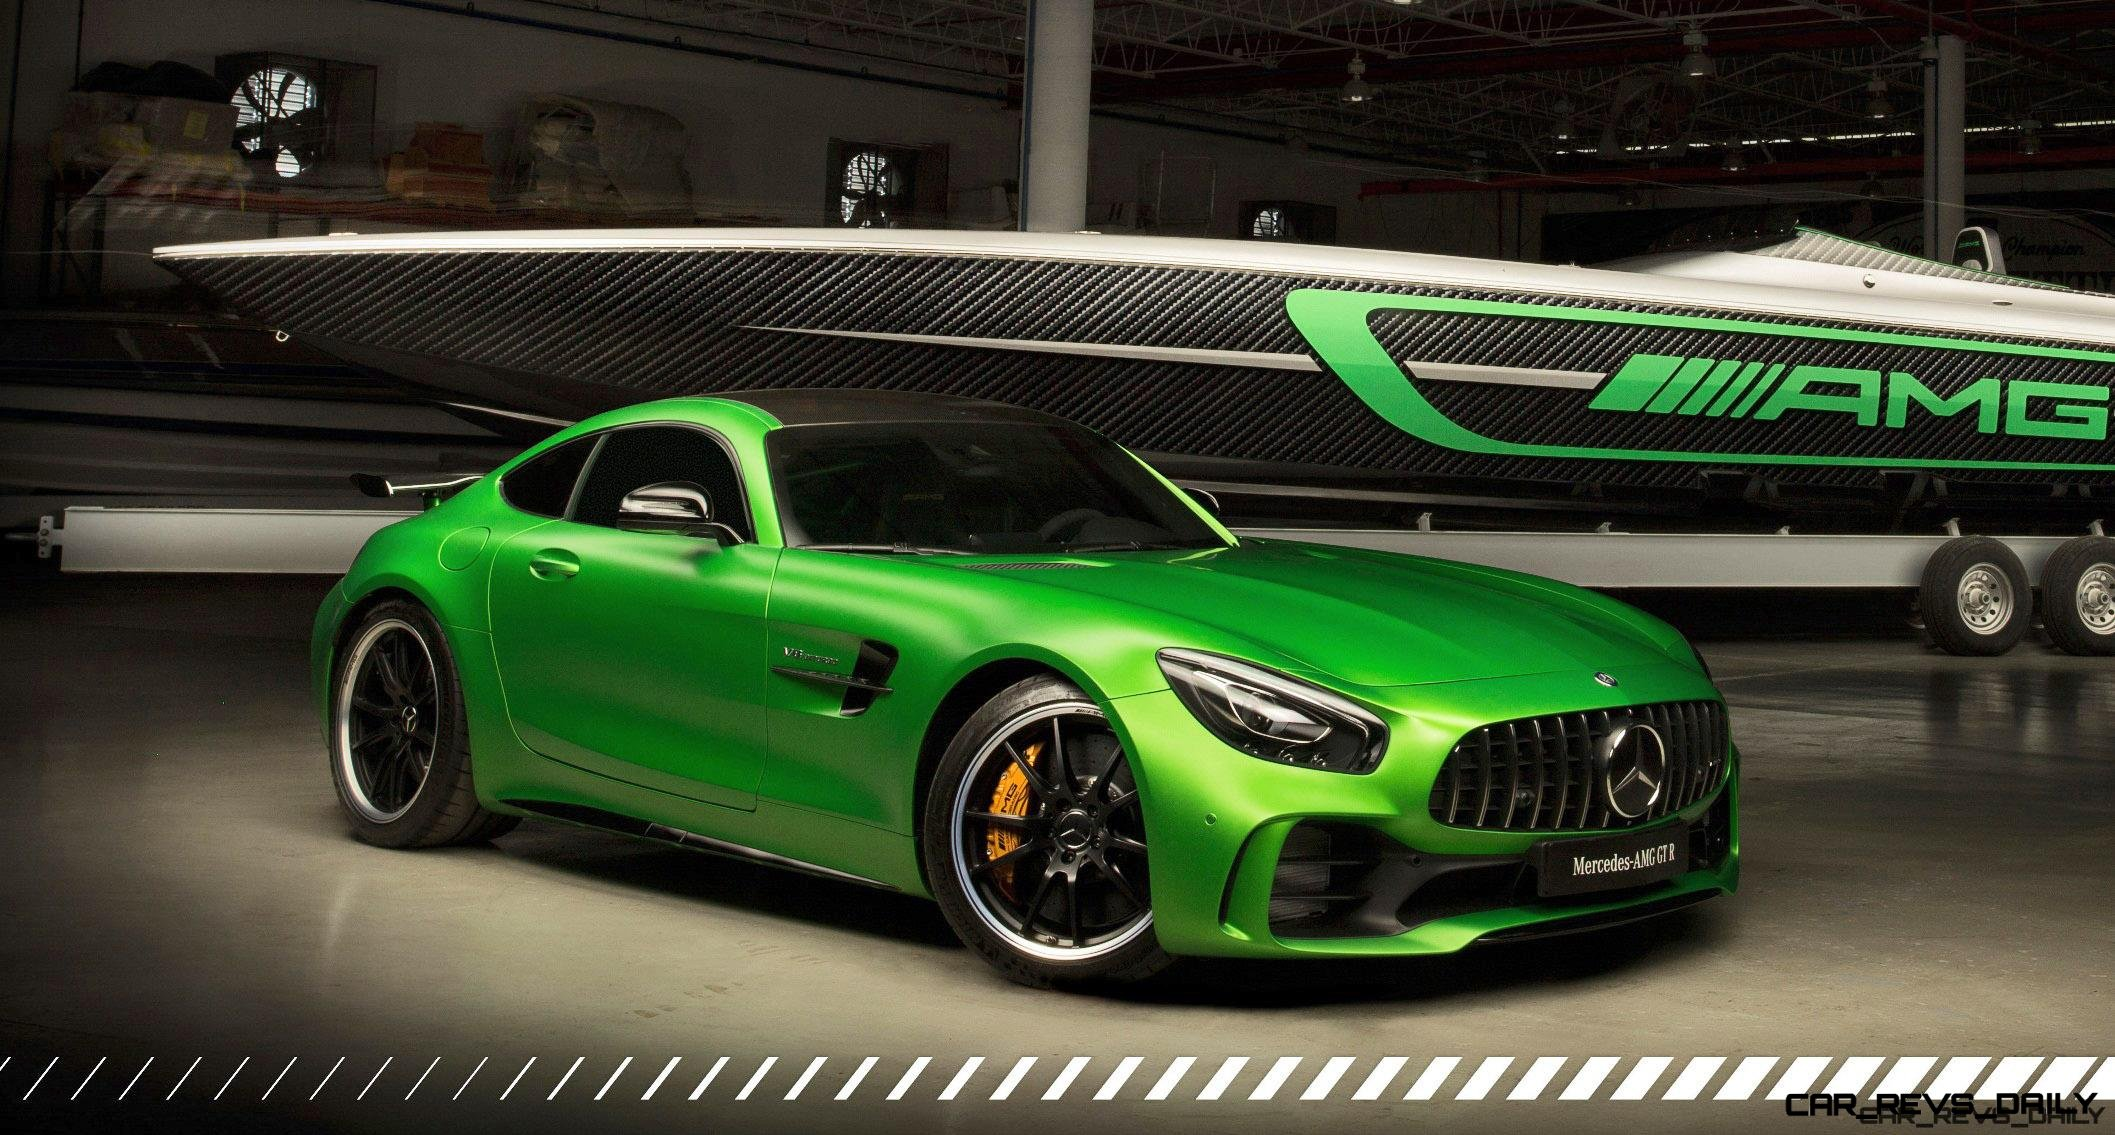 Mercedes benz amg gtr car image idea for Mercedes benz gtr amg 2017 price